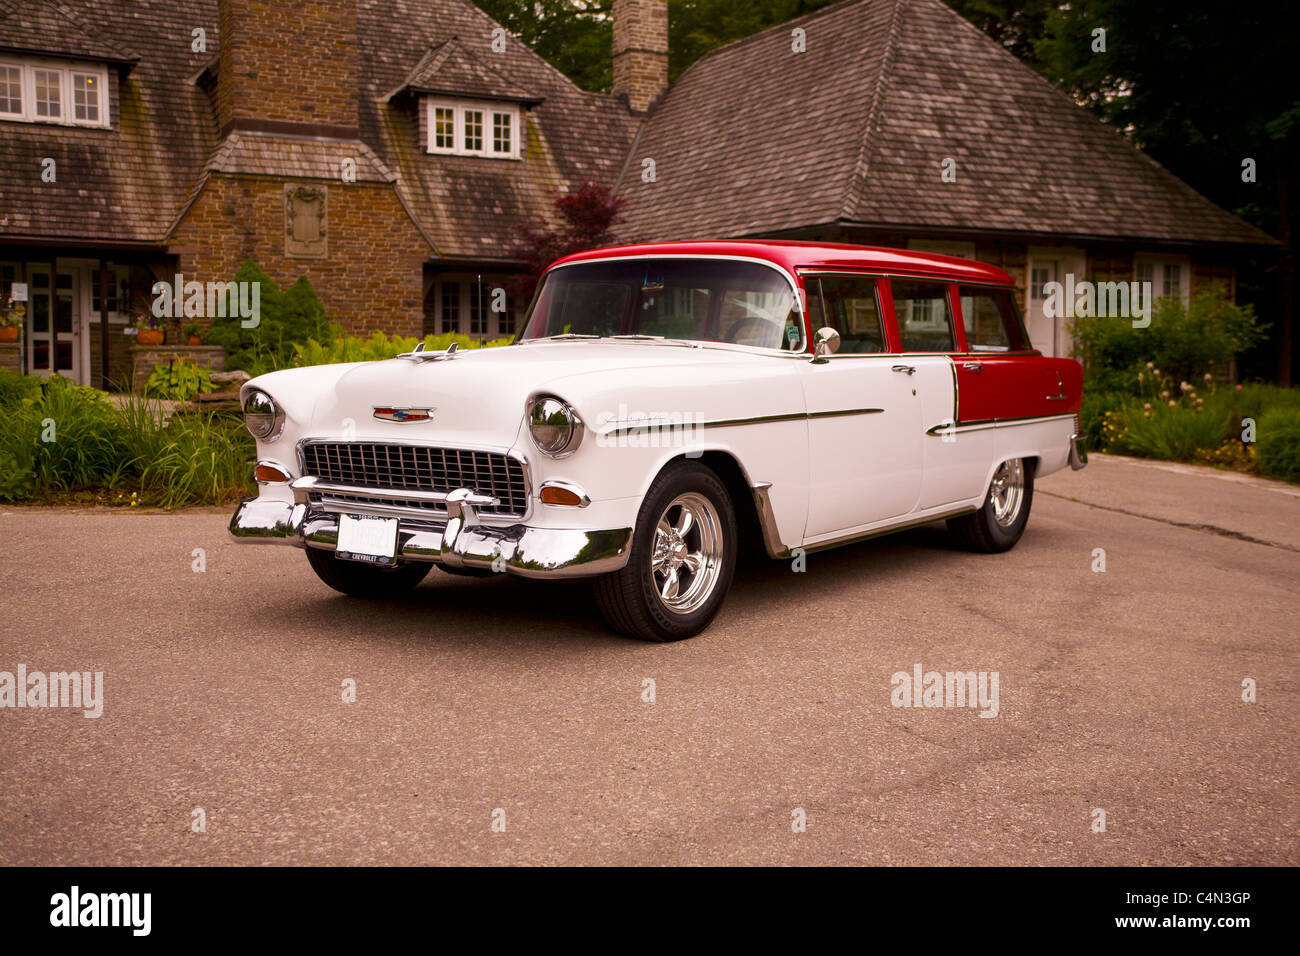 Chevrolet chevrolet station wagon : 1955 Chevrolet Station Wagon Stock Photo, Royalty Free Image ...